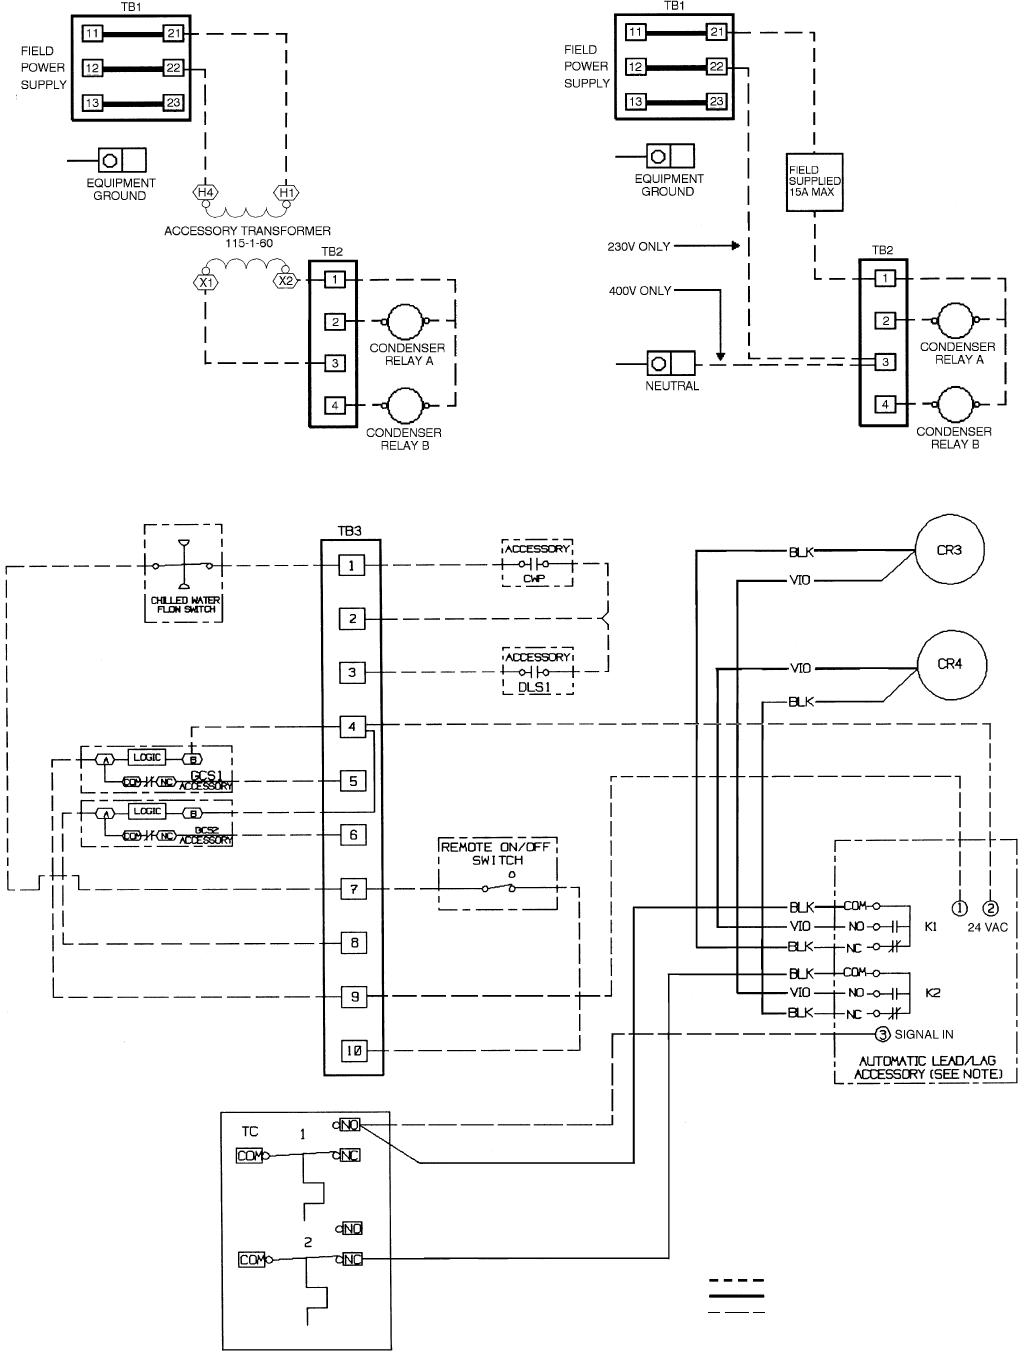 Chiller Compressor Wiring Diagram : Carrier gx chiller wiring diagram